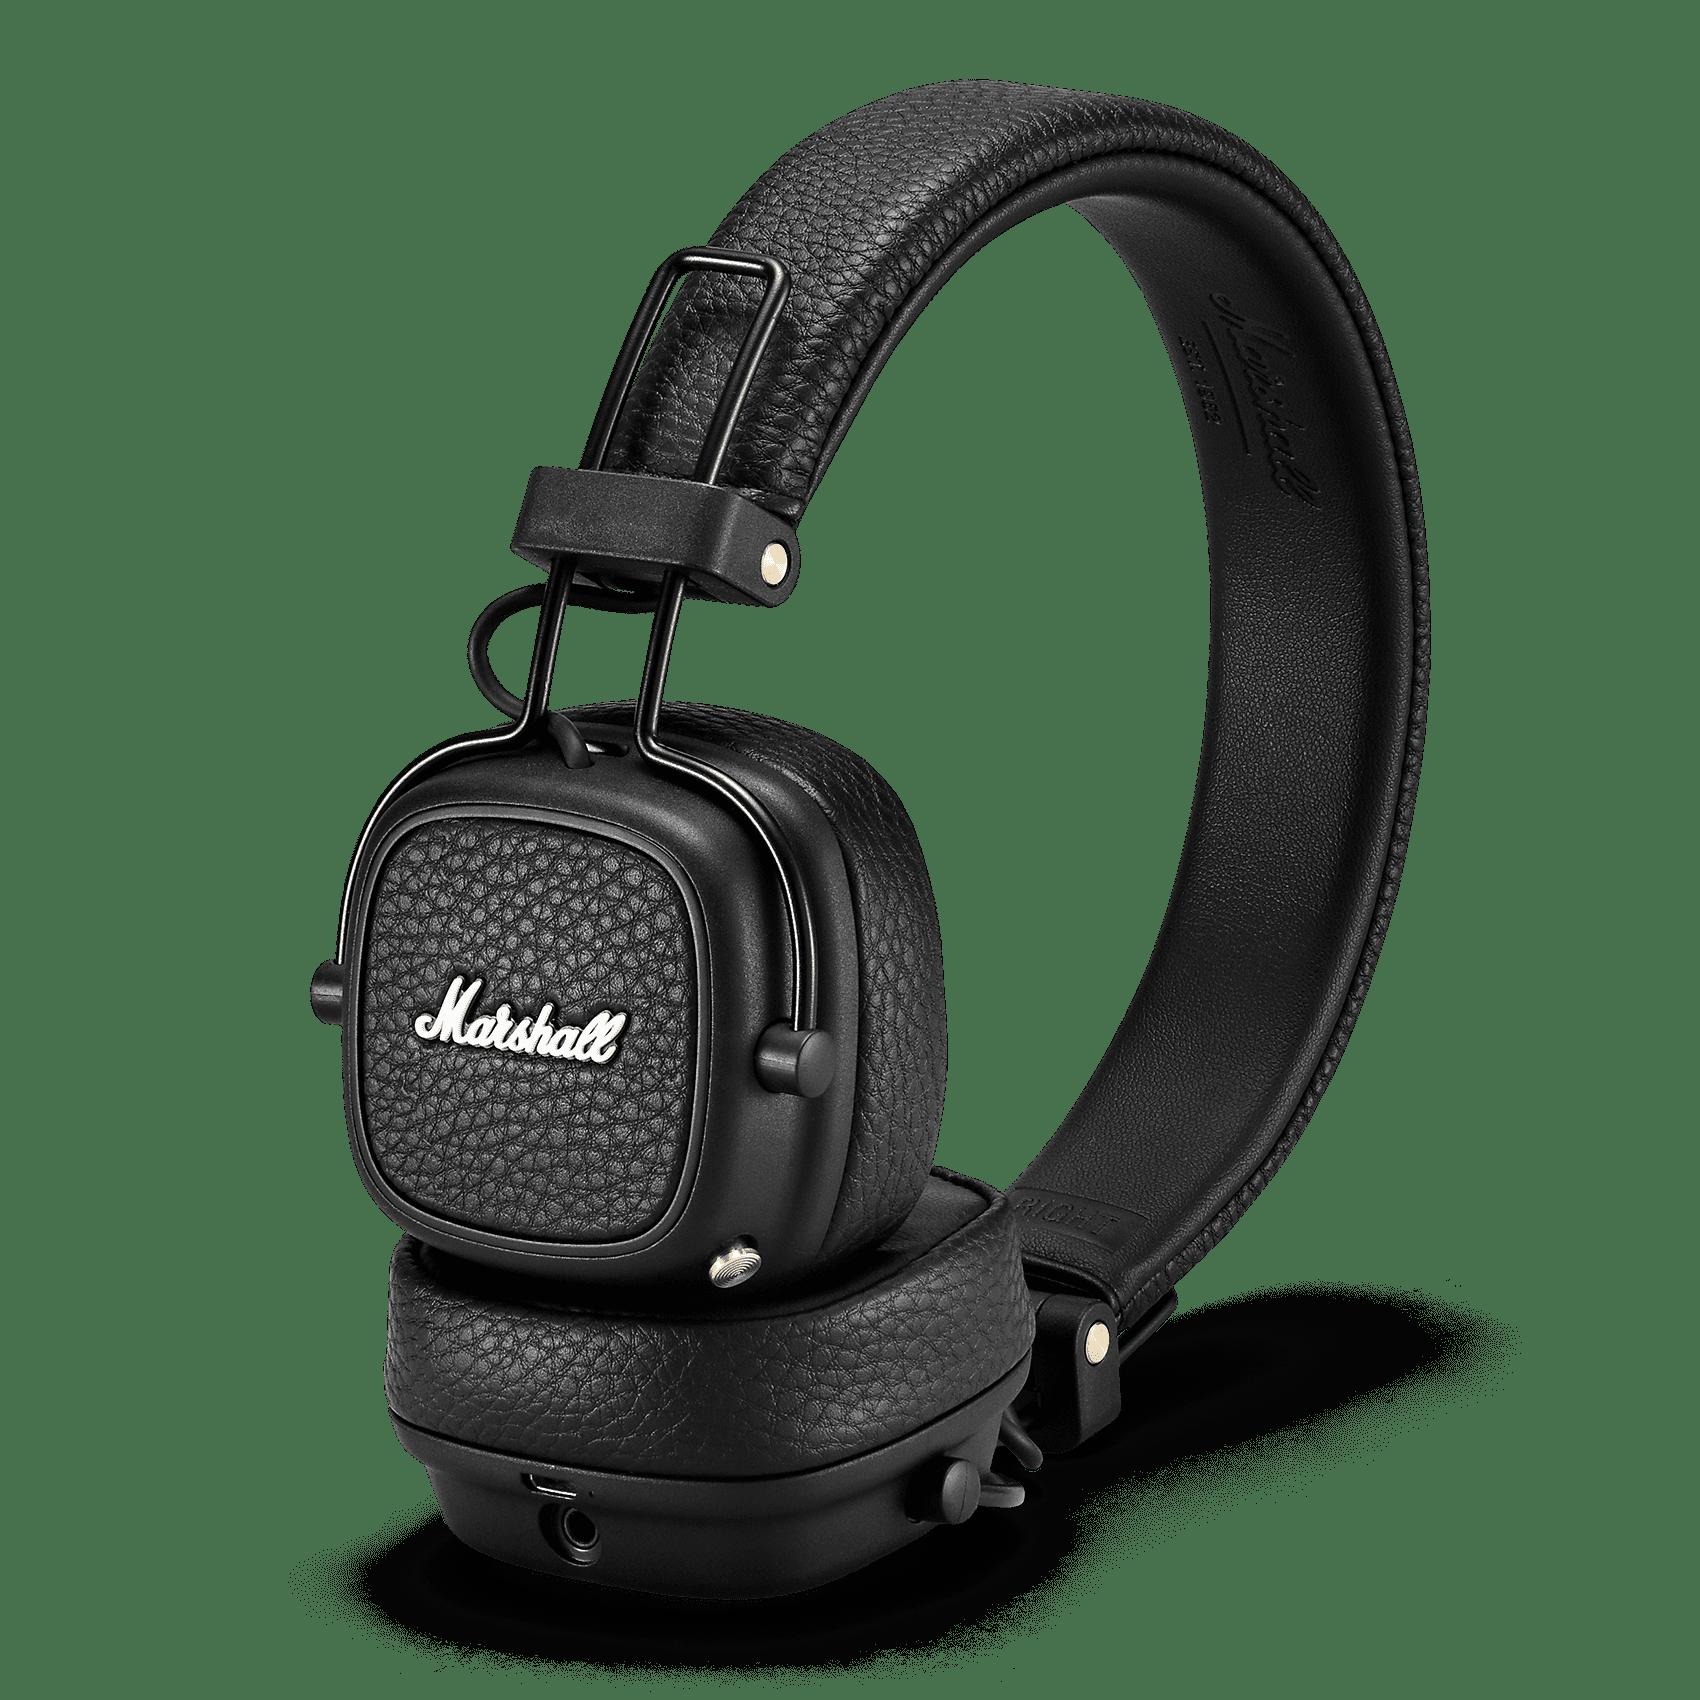 Official Marshall Headphones Speakers Store Marshall